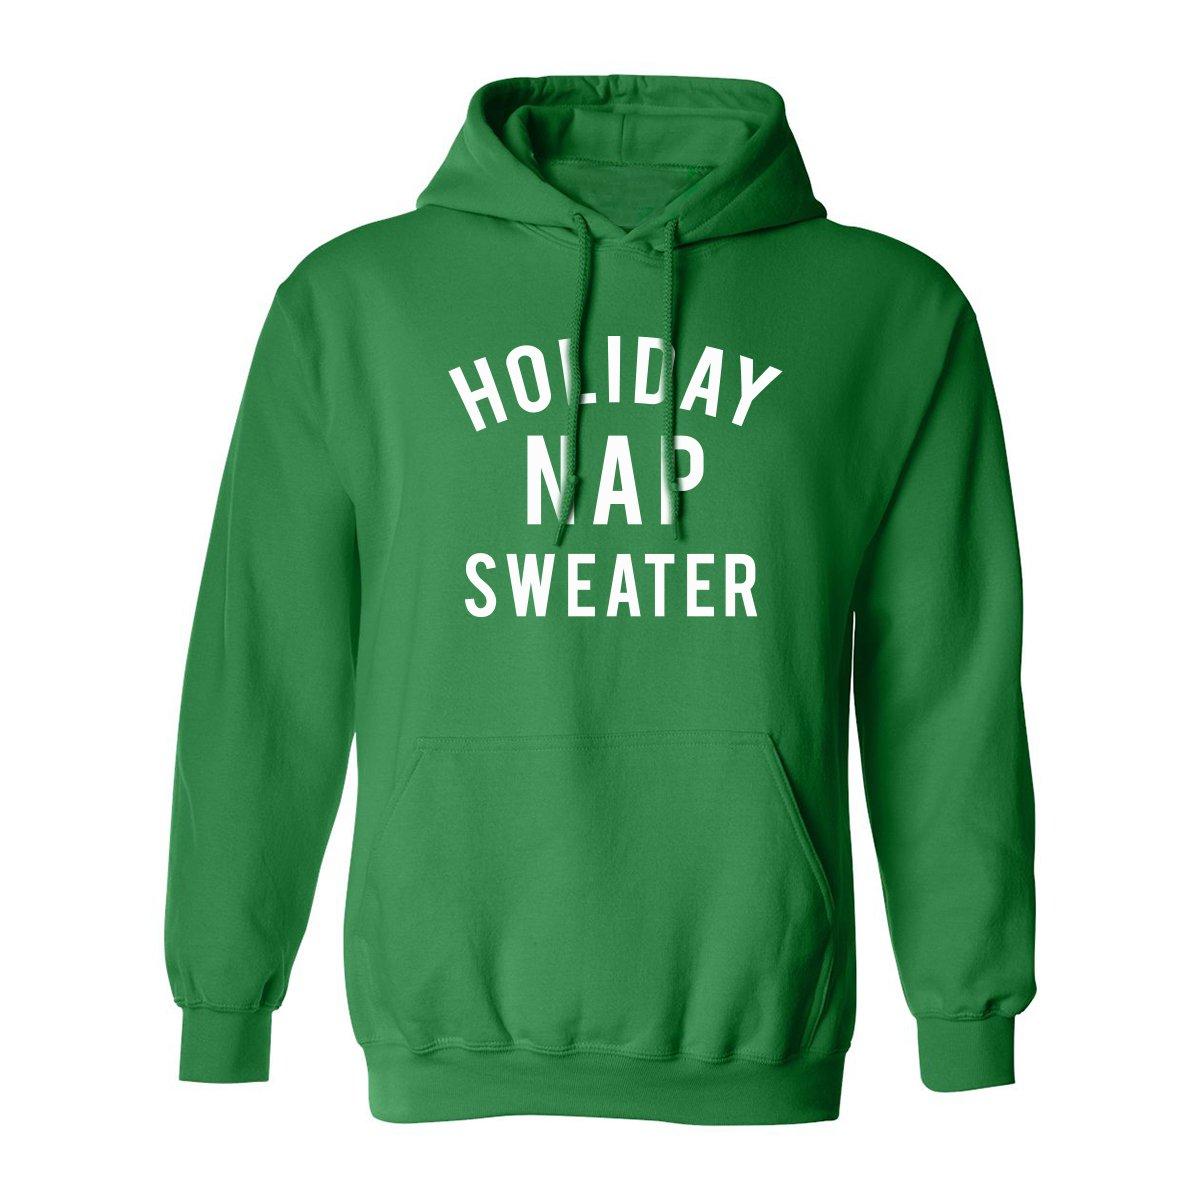 ZeroGravitee Holiday Nap Sweater Adult Hooded Sweatshirt PA-3228-HD